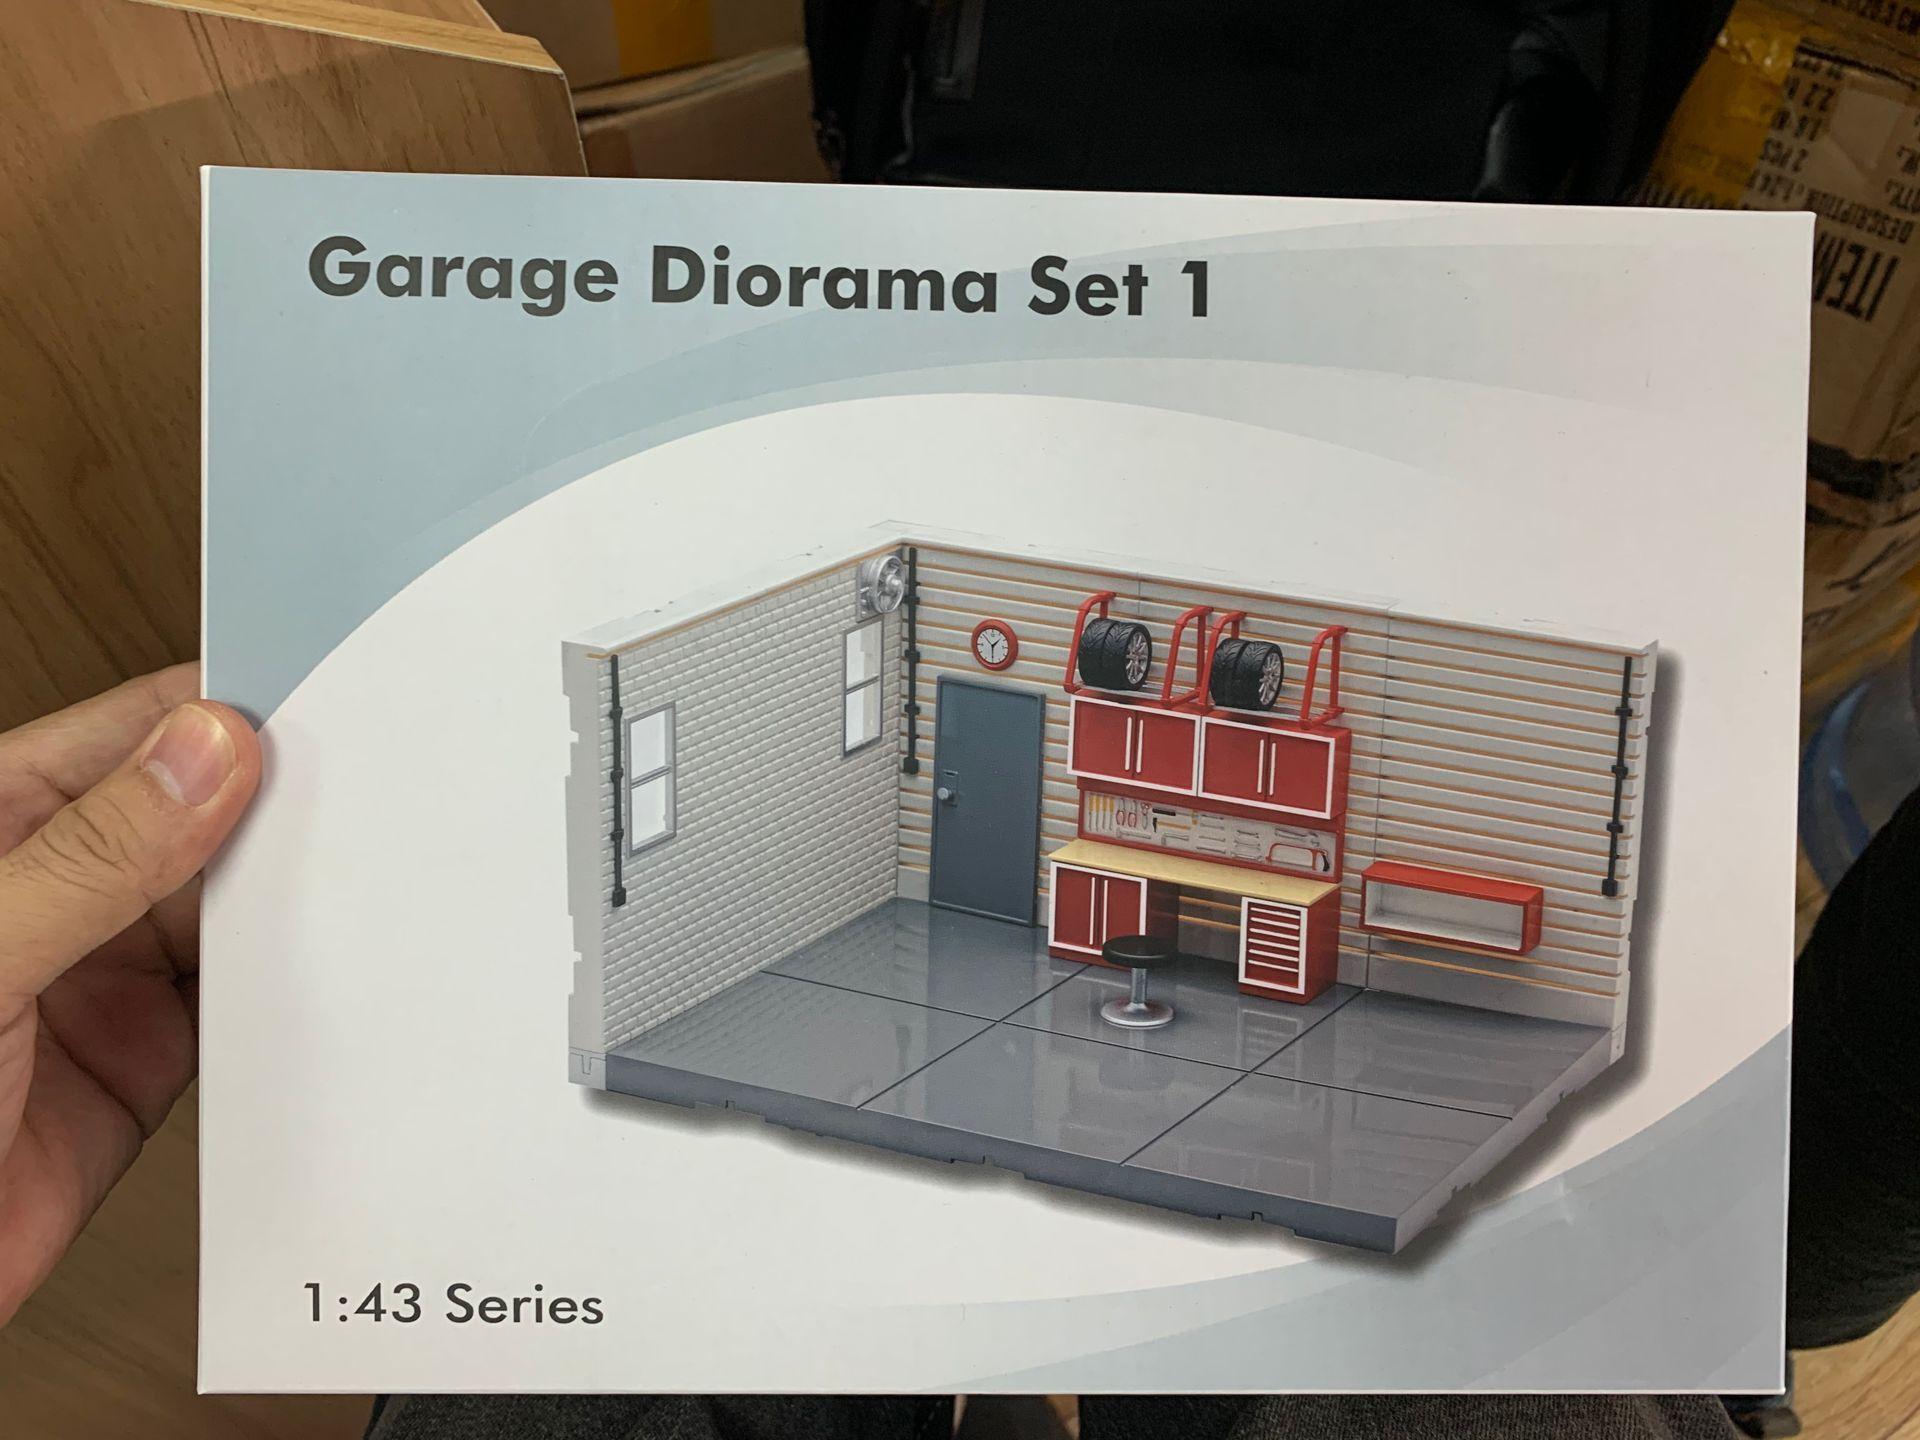 Aurora Garage Diorama Set 1 1:43 Scale Series Scene Model Blue